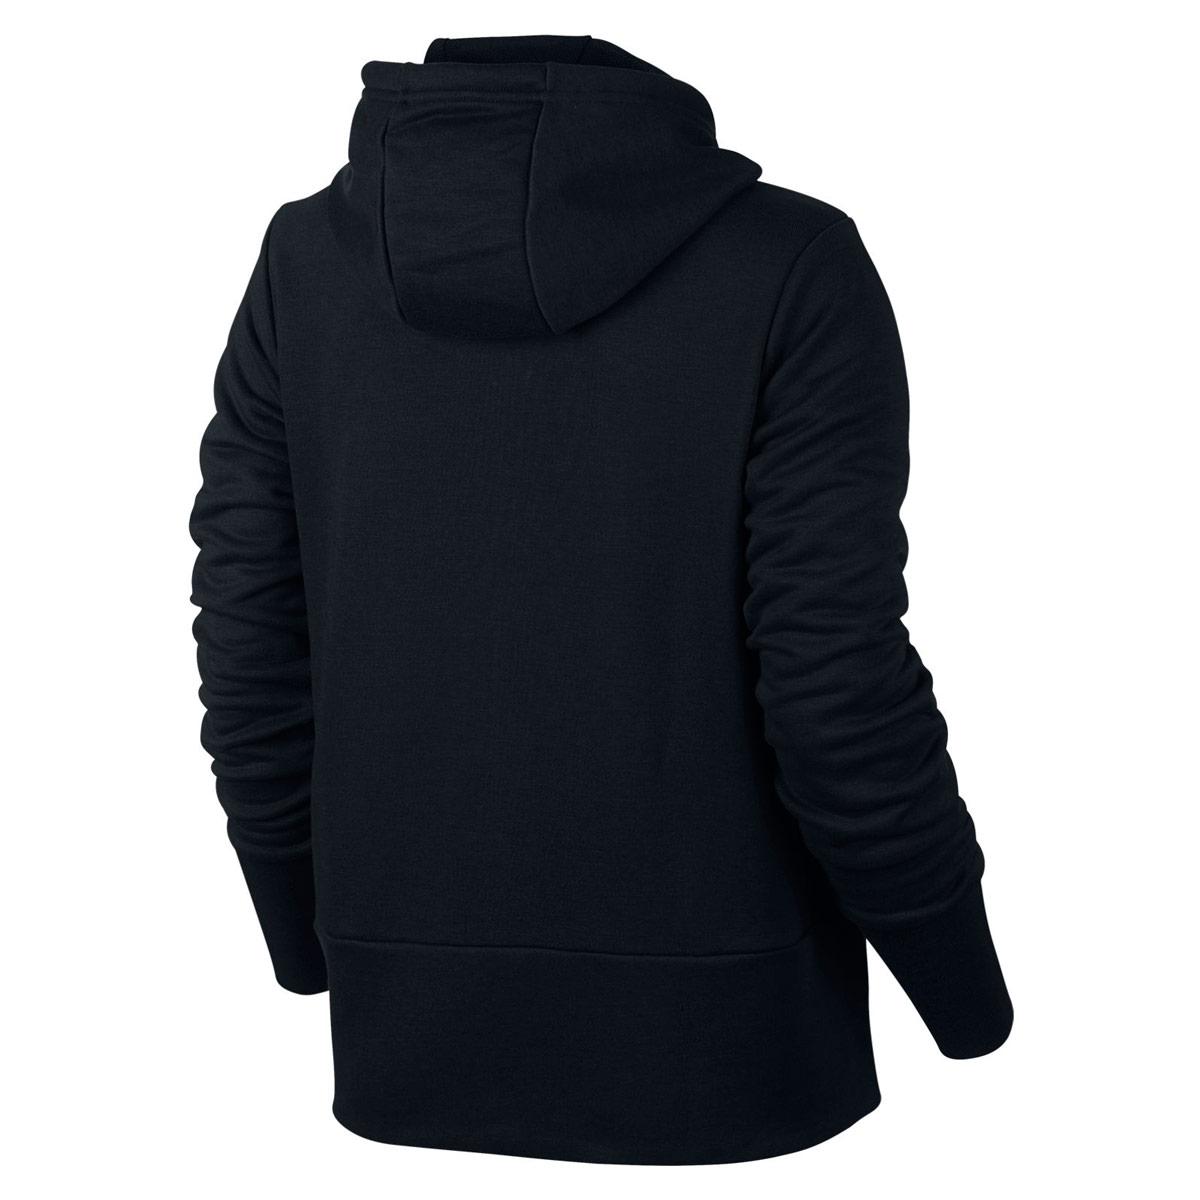 73e968d6bed4 Nike Dry Training Hoodie - Sweatshirts   Hoodies for Women - Black ...